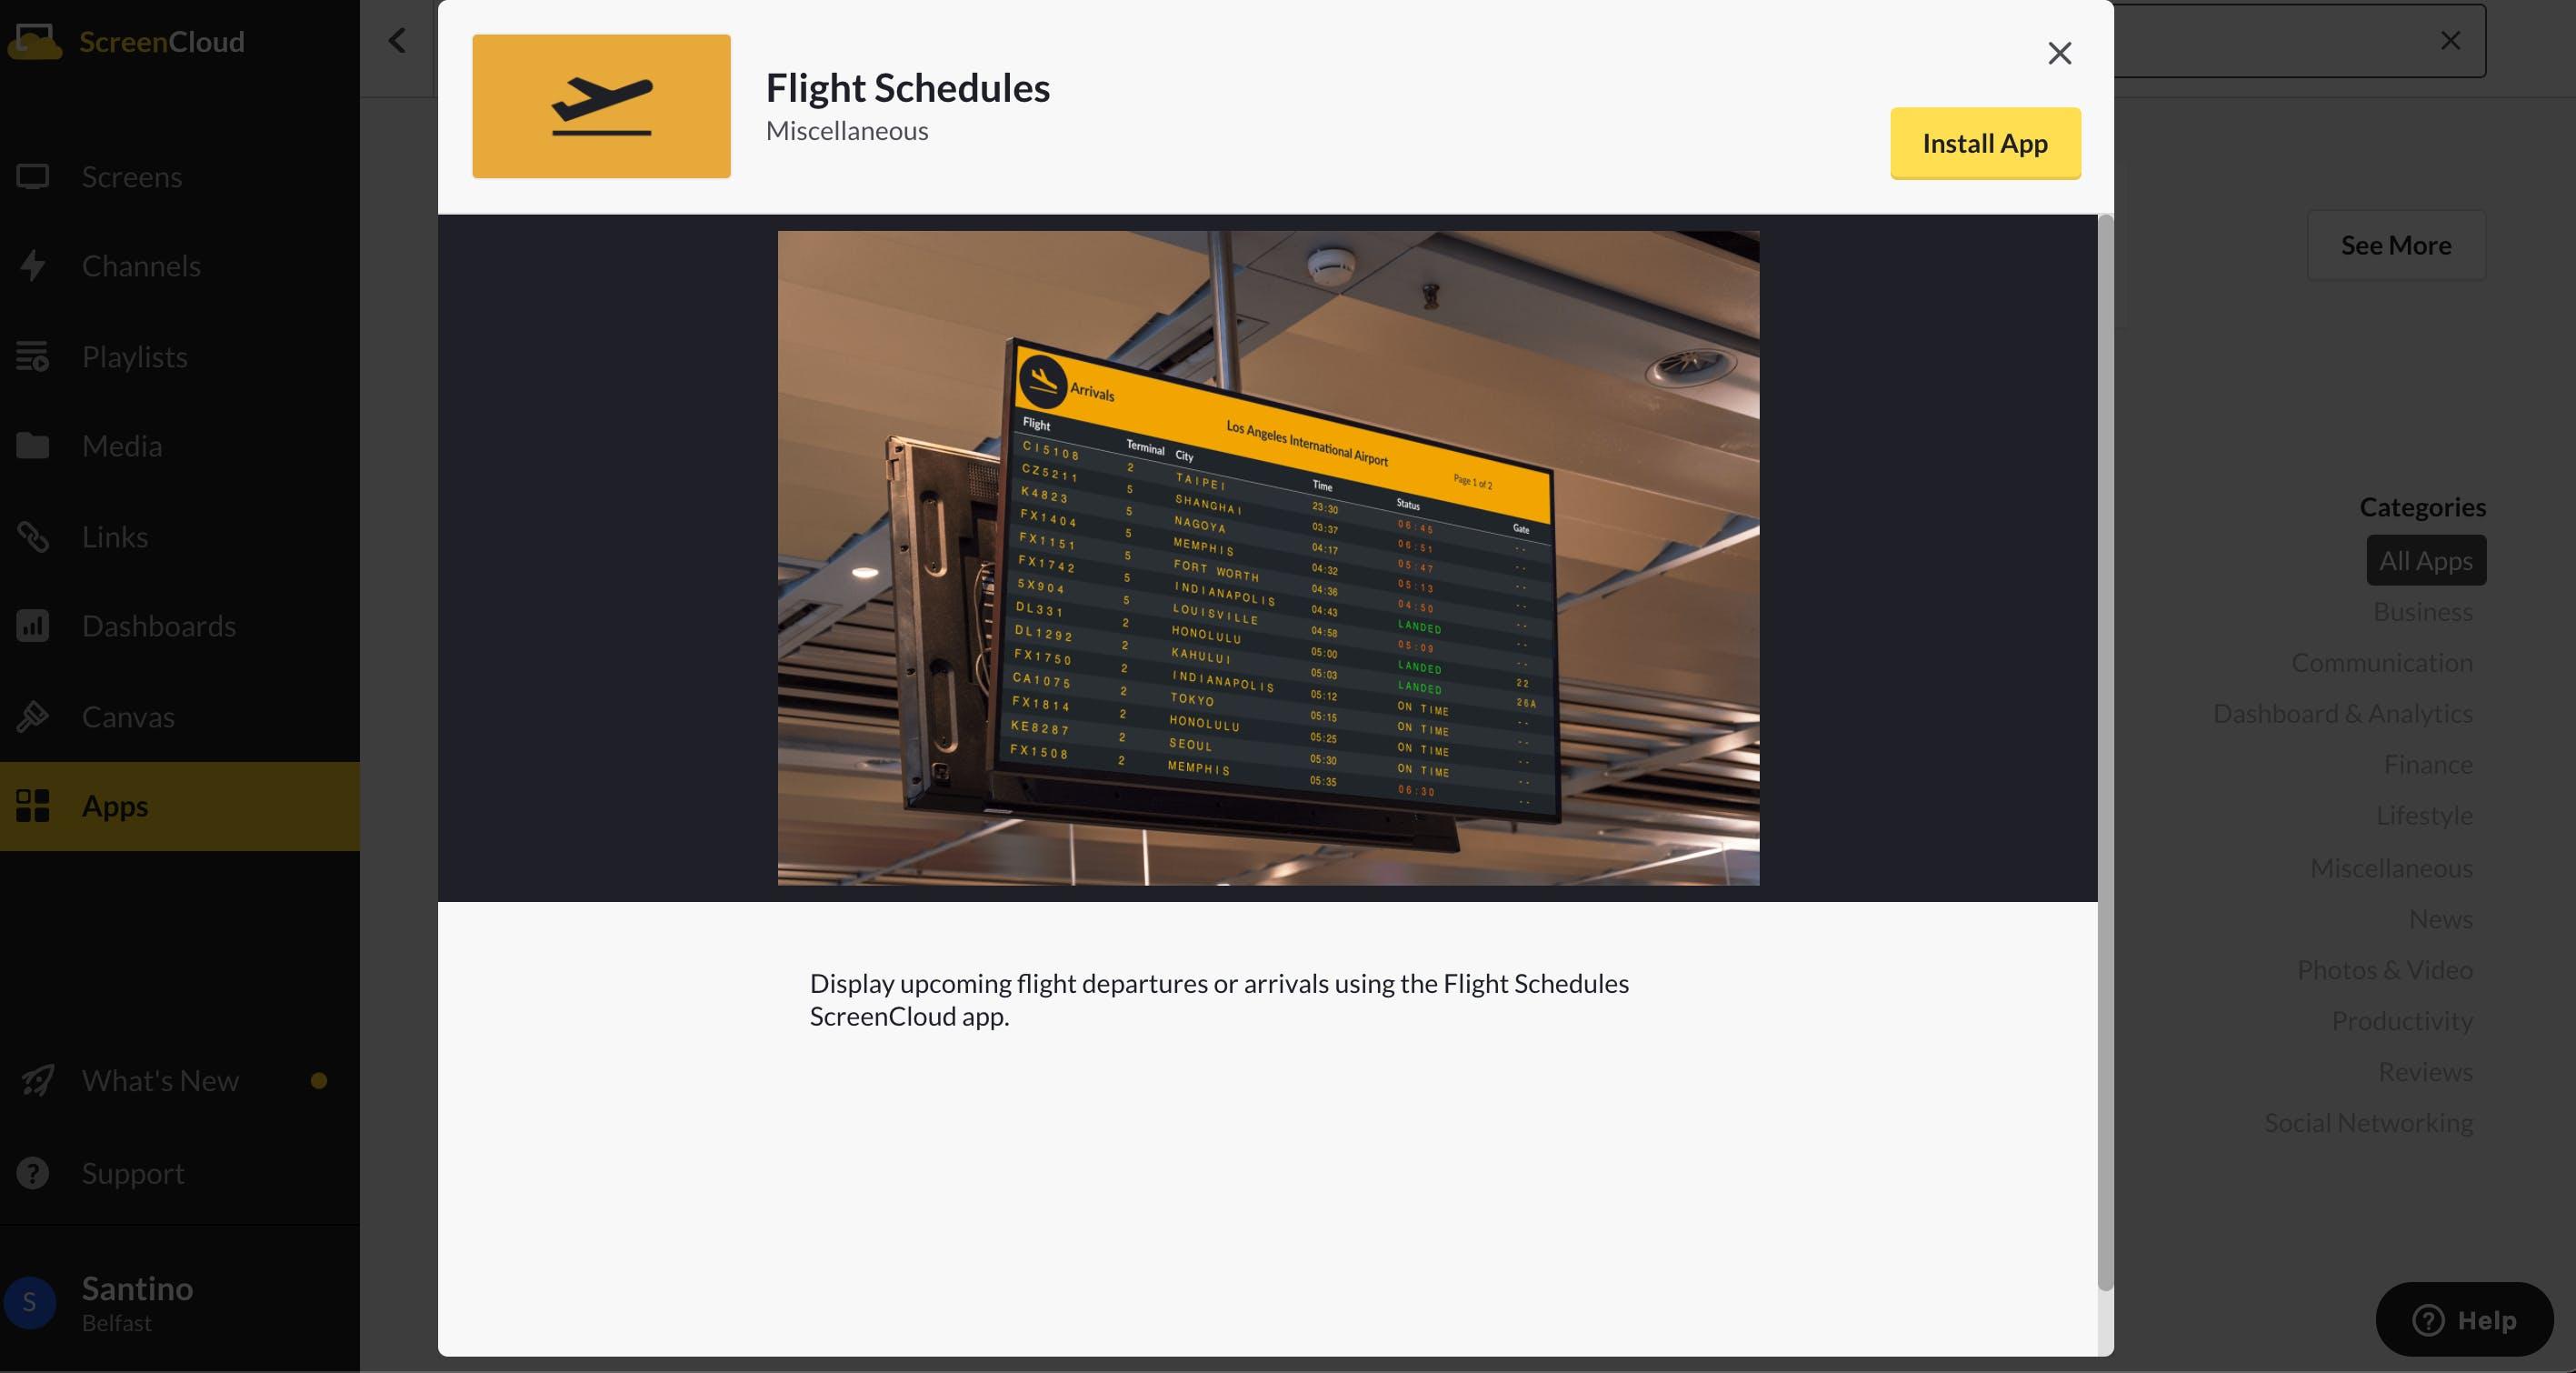 ScreenCloud Flight Schedule App Guide - Install App 5.12.2021.png